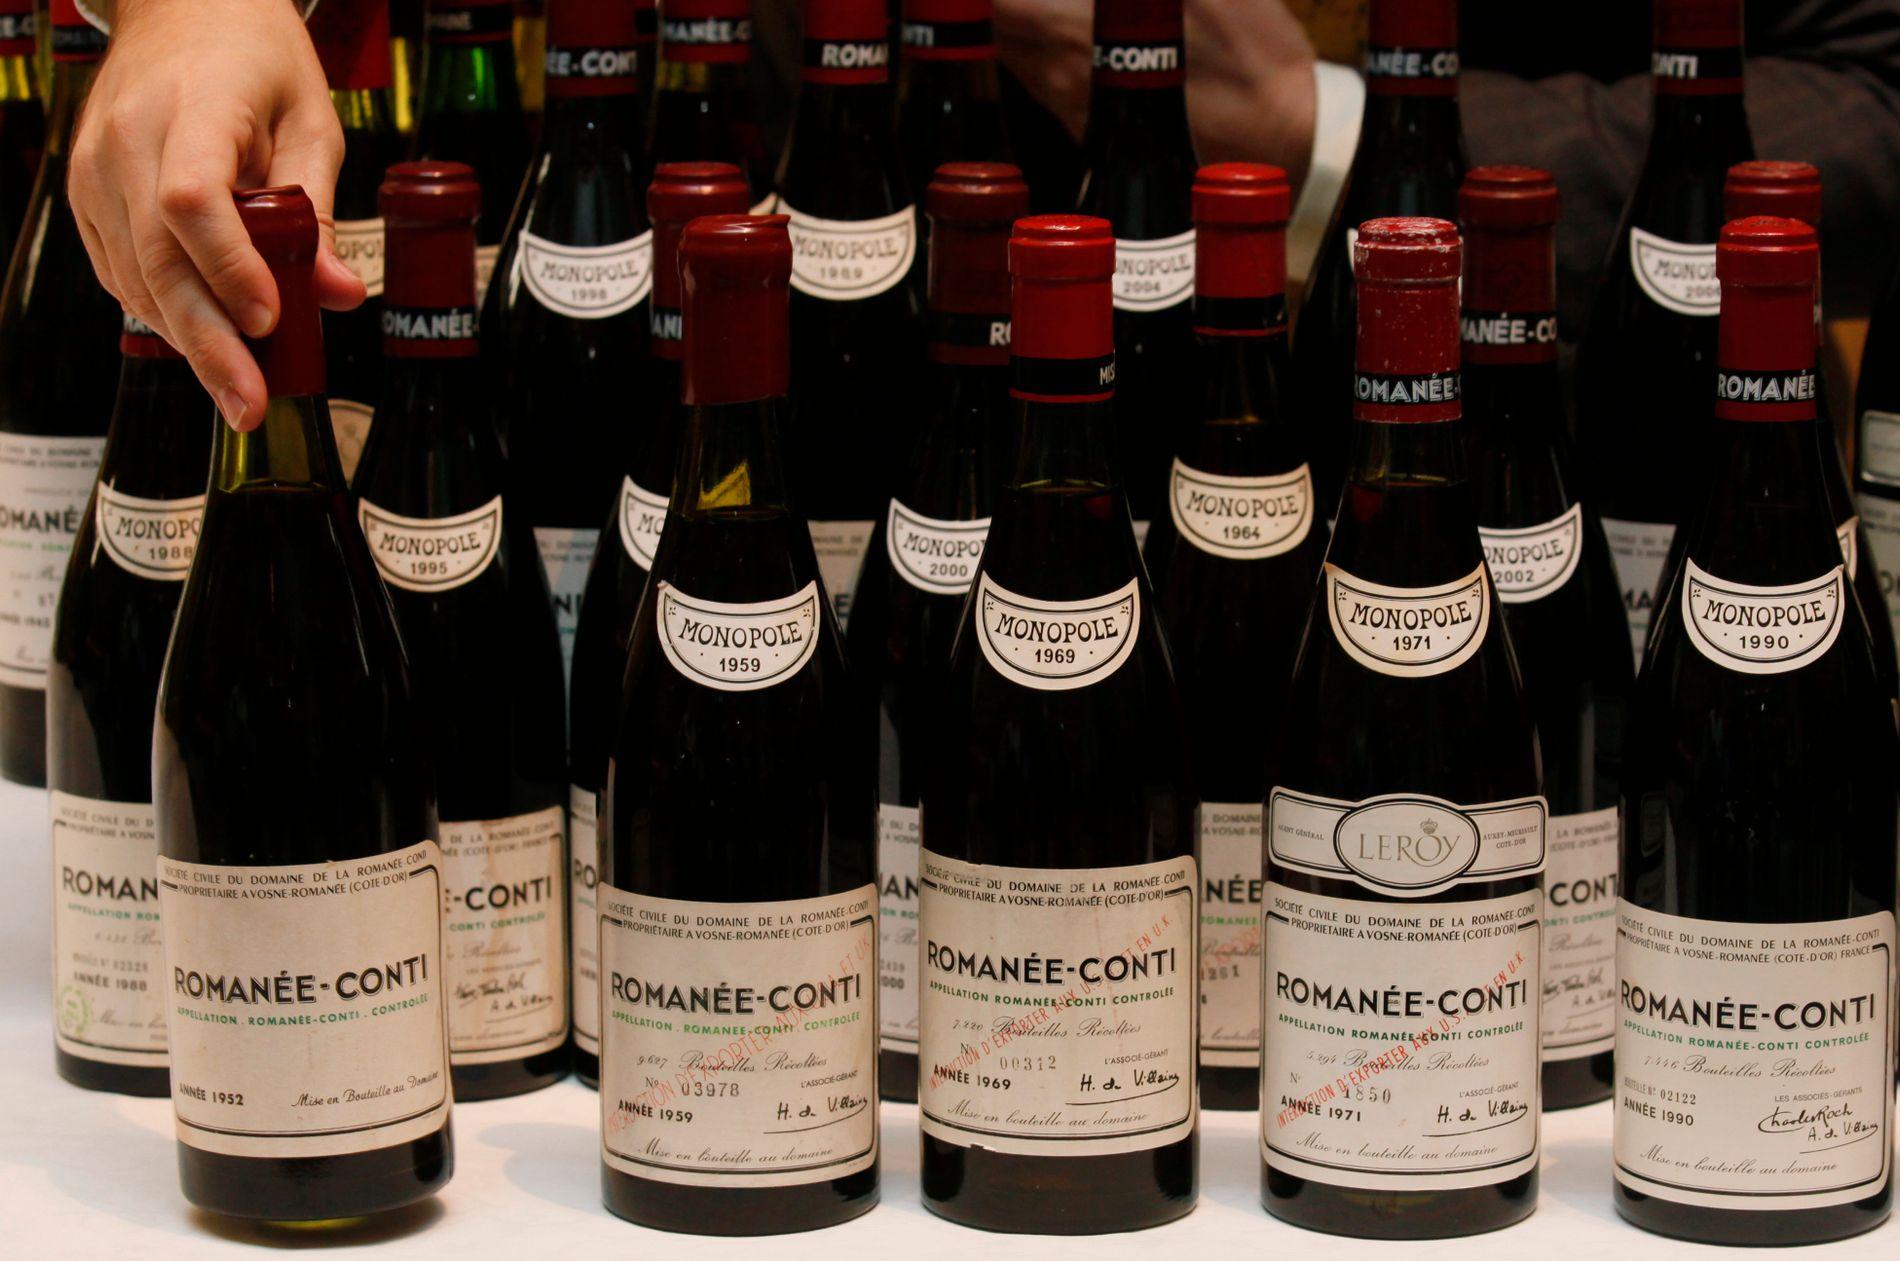 EDLE DRÅPER: Et parti på 55 flasker Romanee Conti fra 1952 til 2007-årgang ble solgt  i Hong Kong i desember 2011.